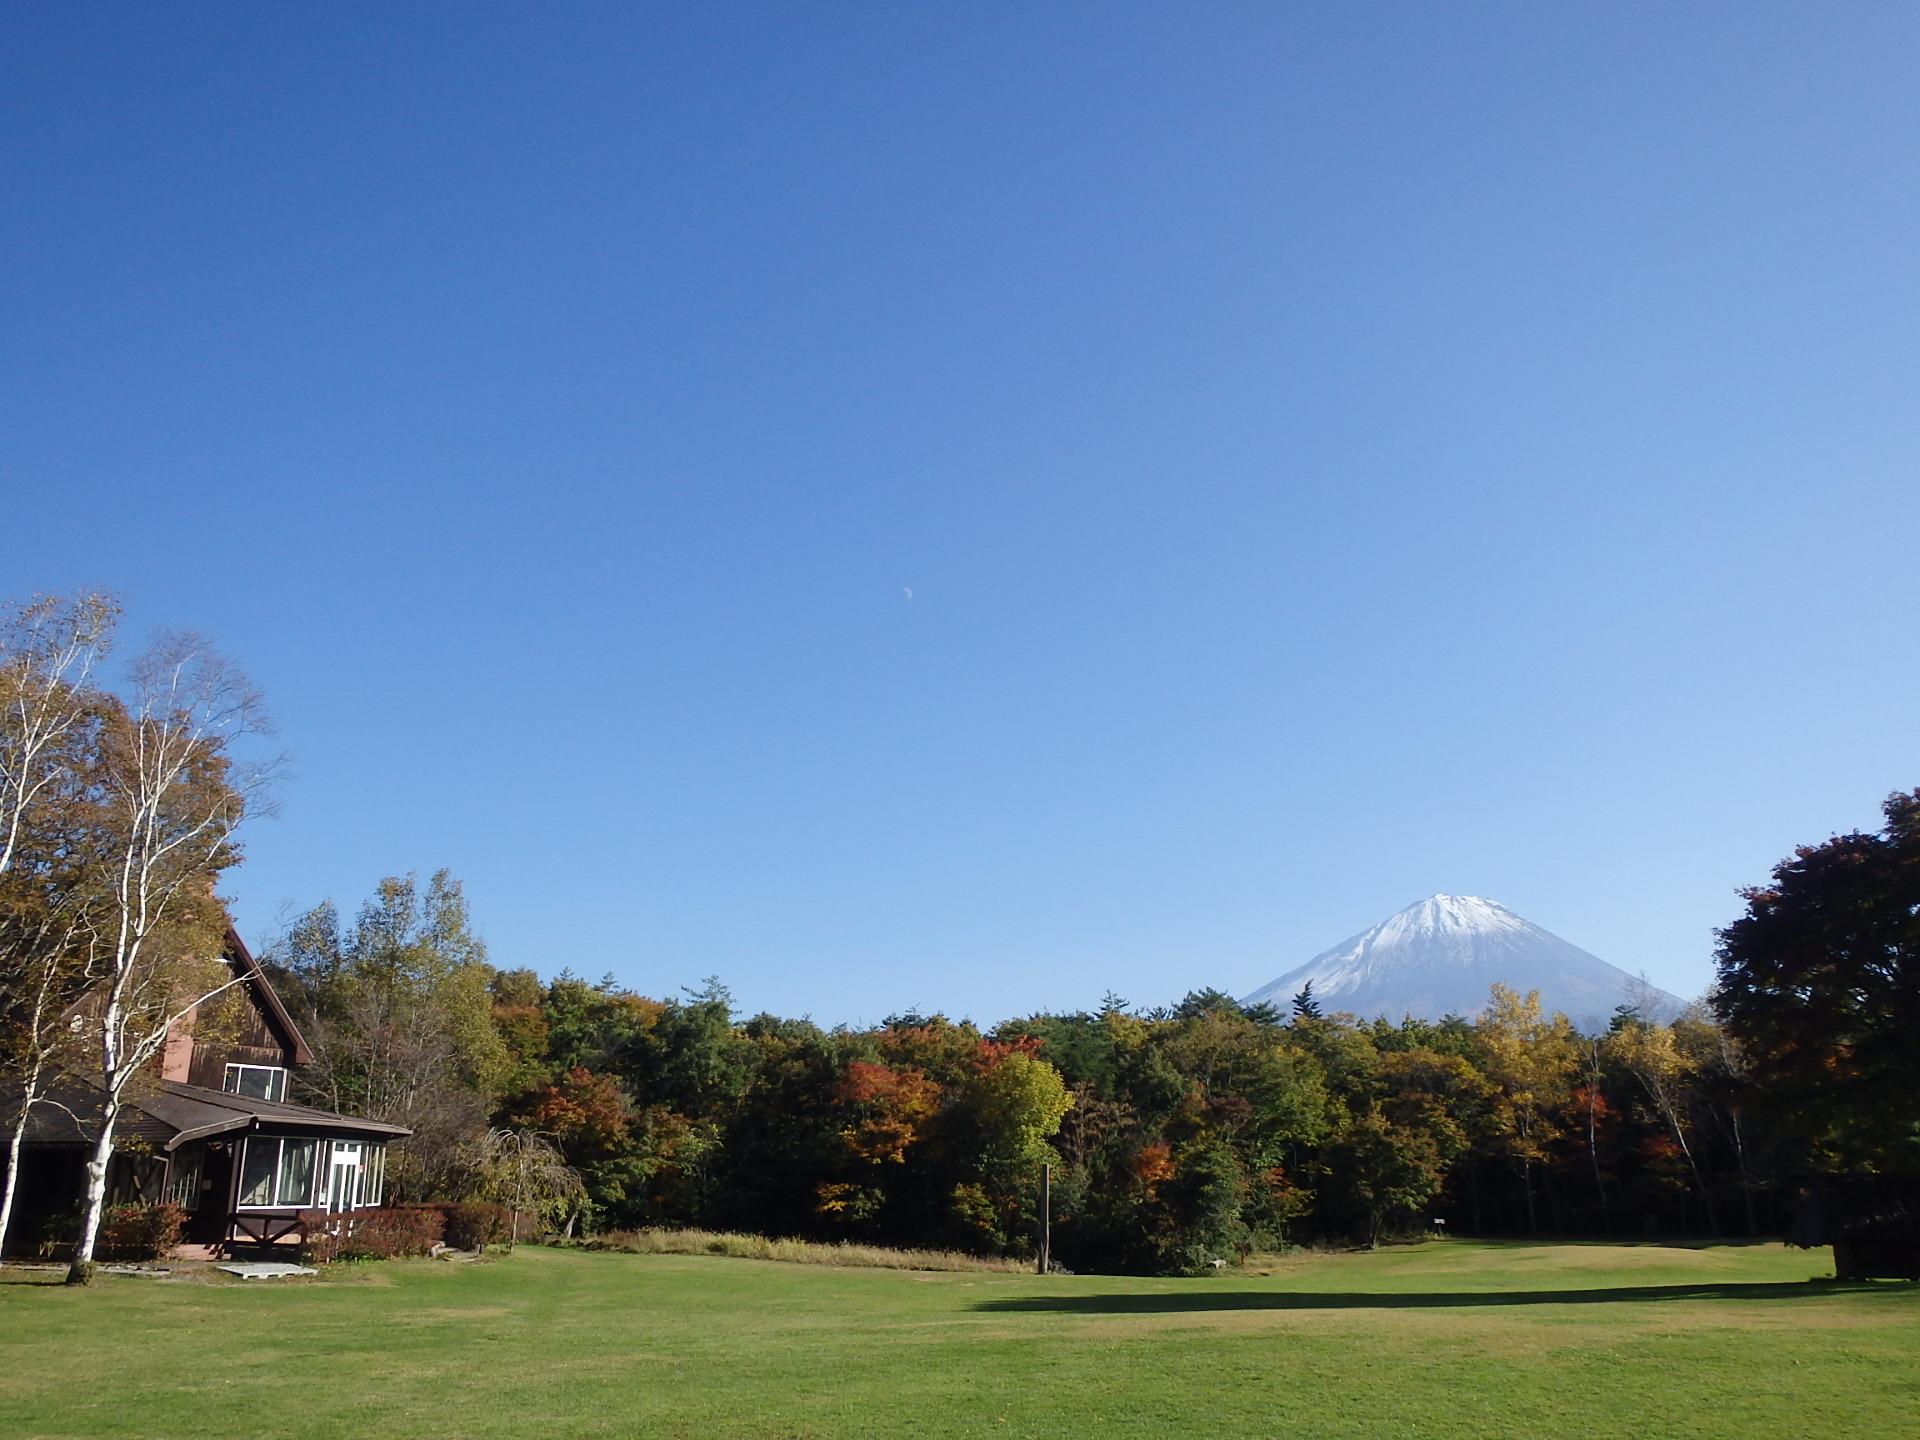 http://www.yamanashi-kankou.jp/blog/L43T9j_13.jpg